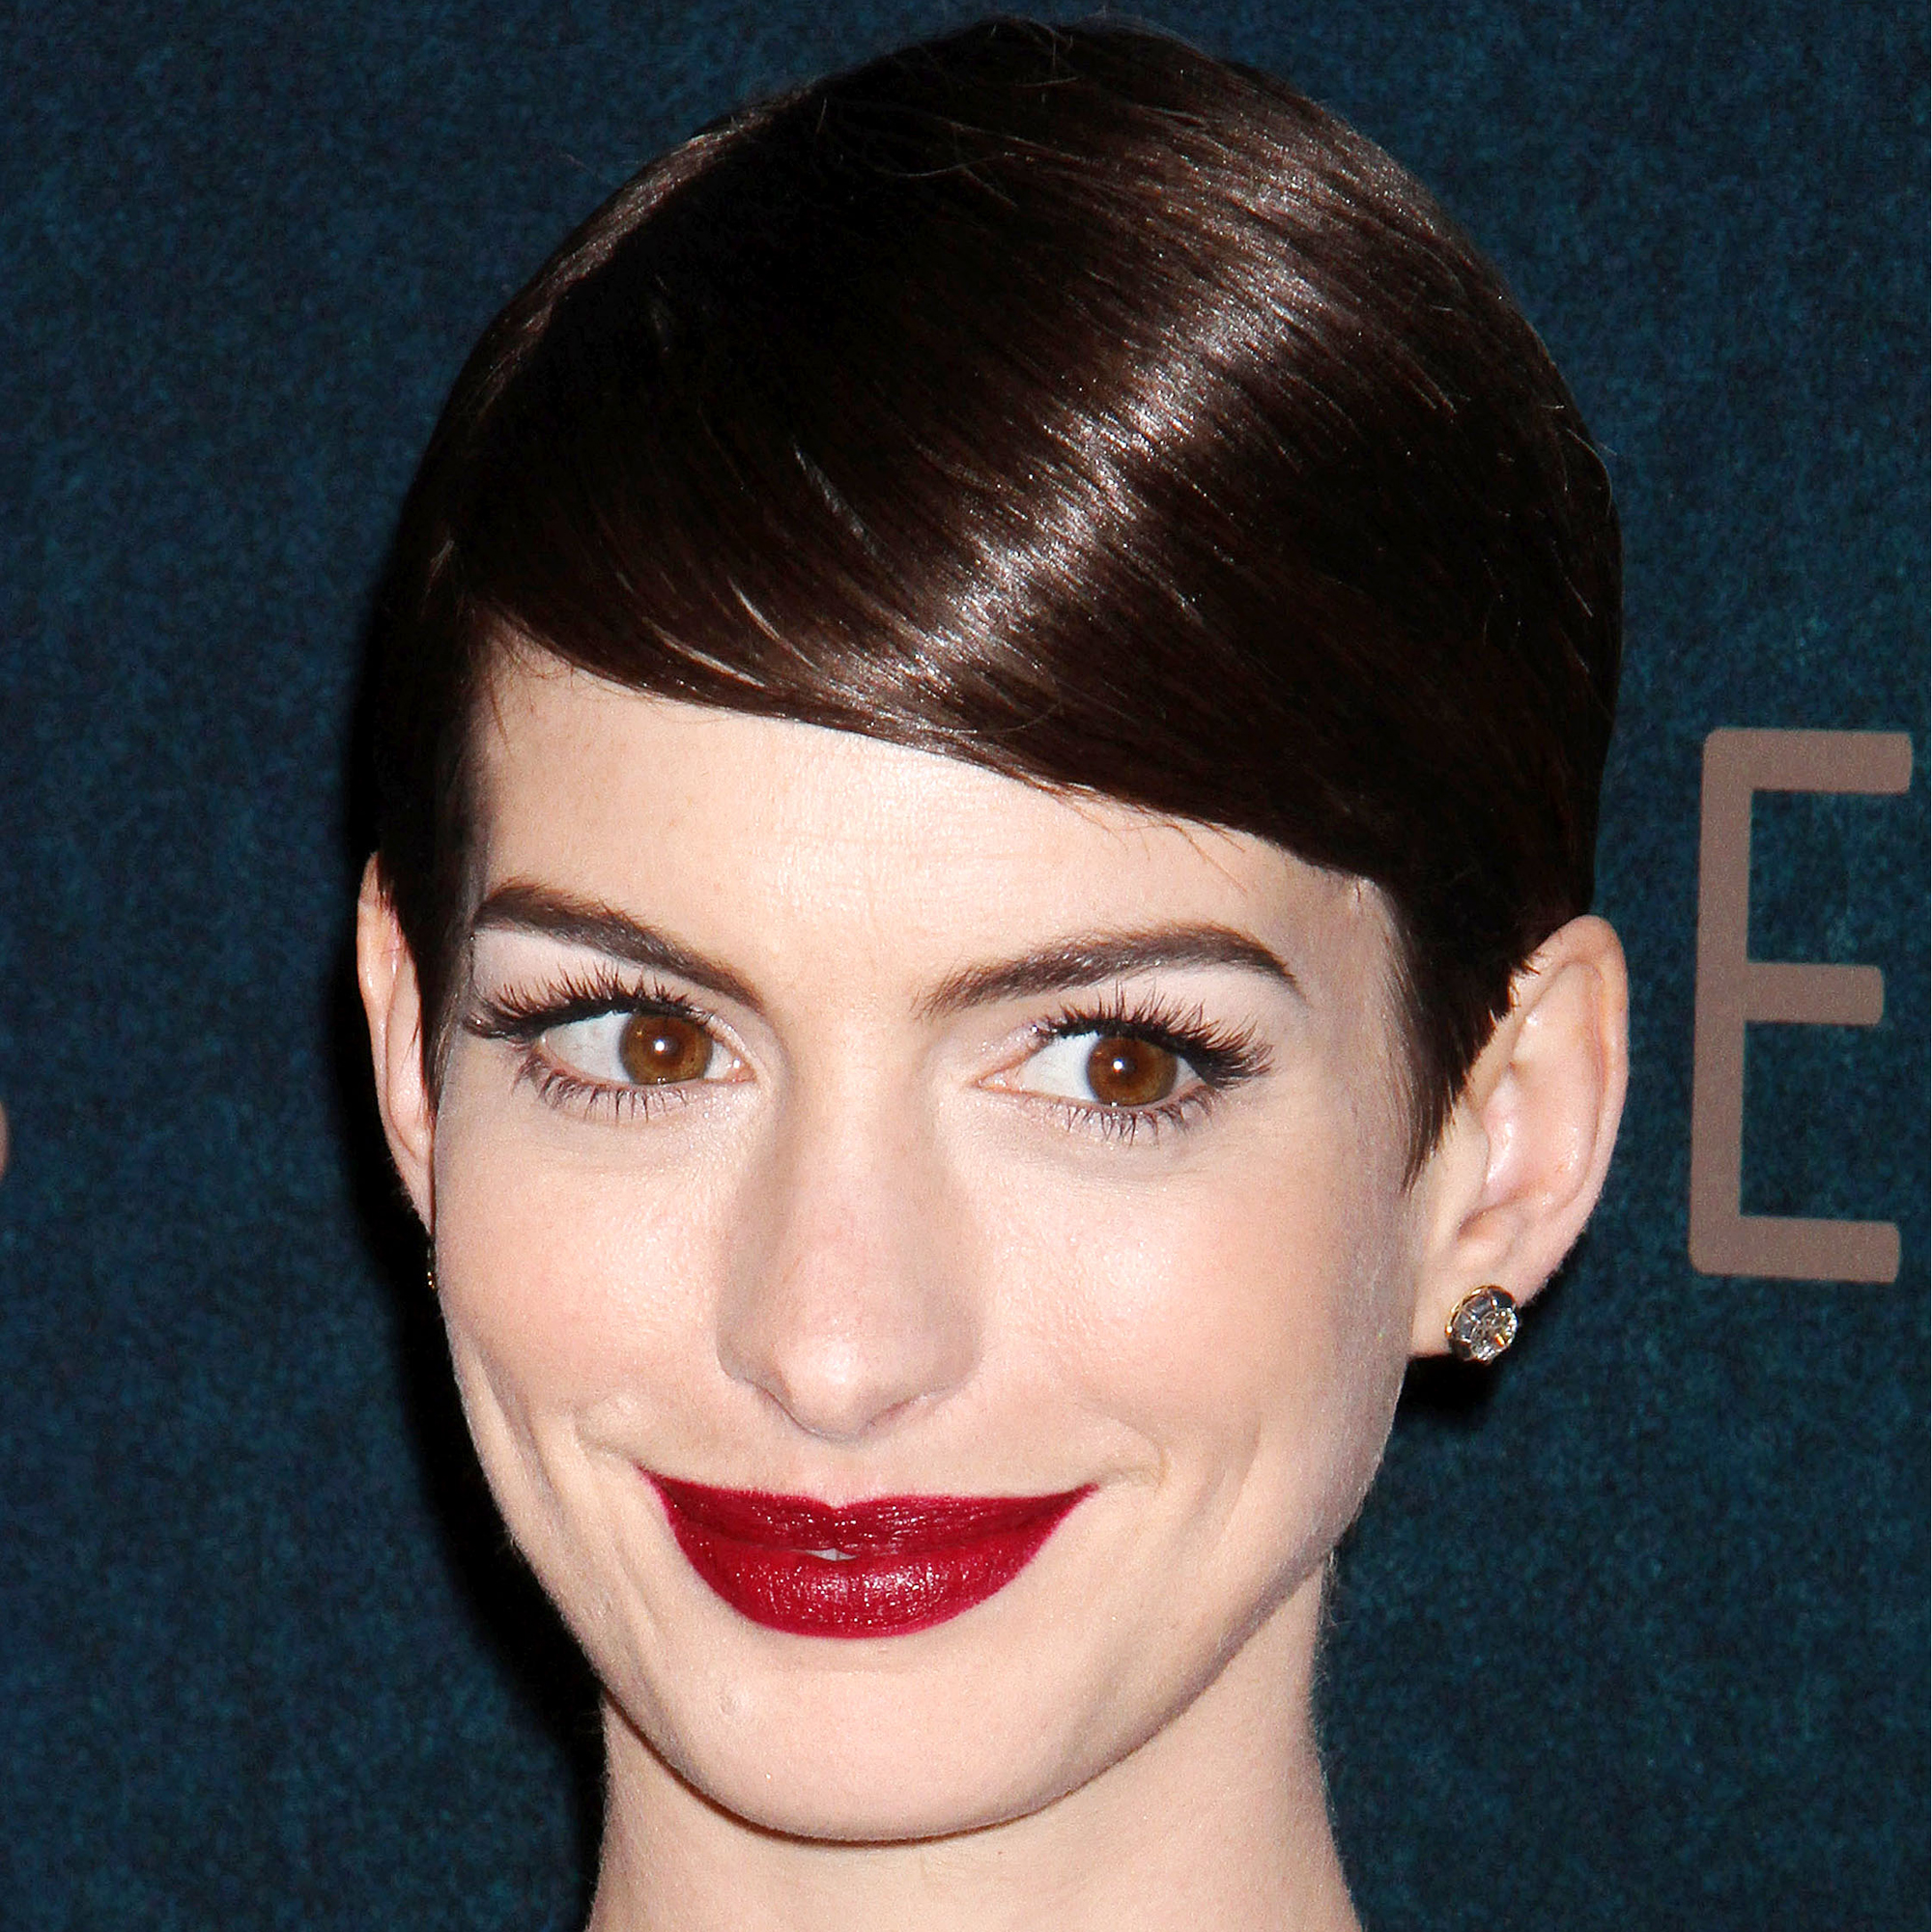 Anne Hathaway celebrity short hairstyles photo